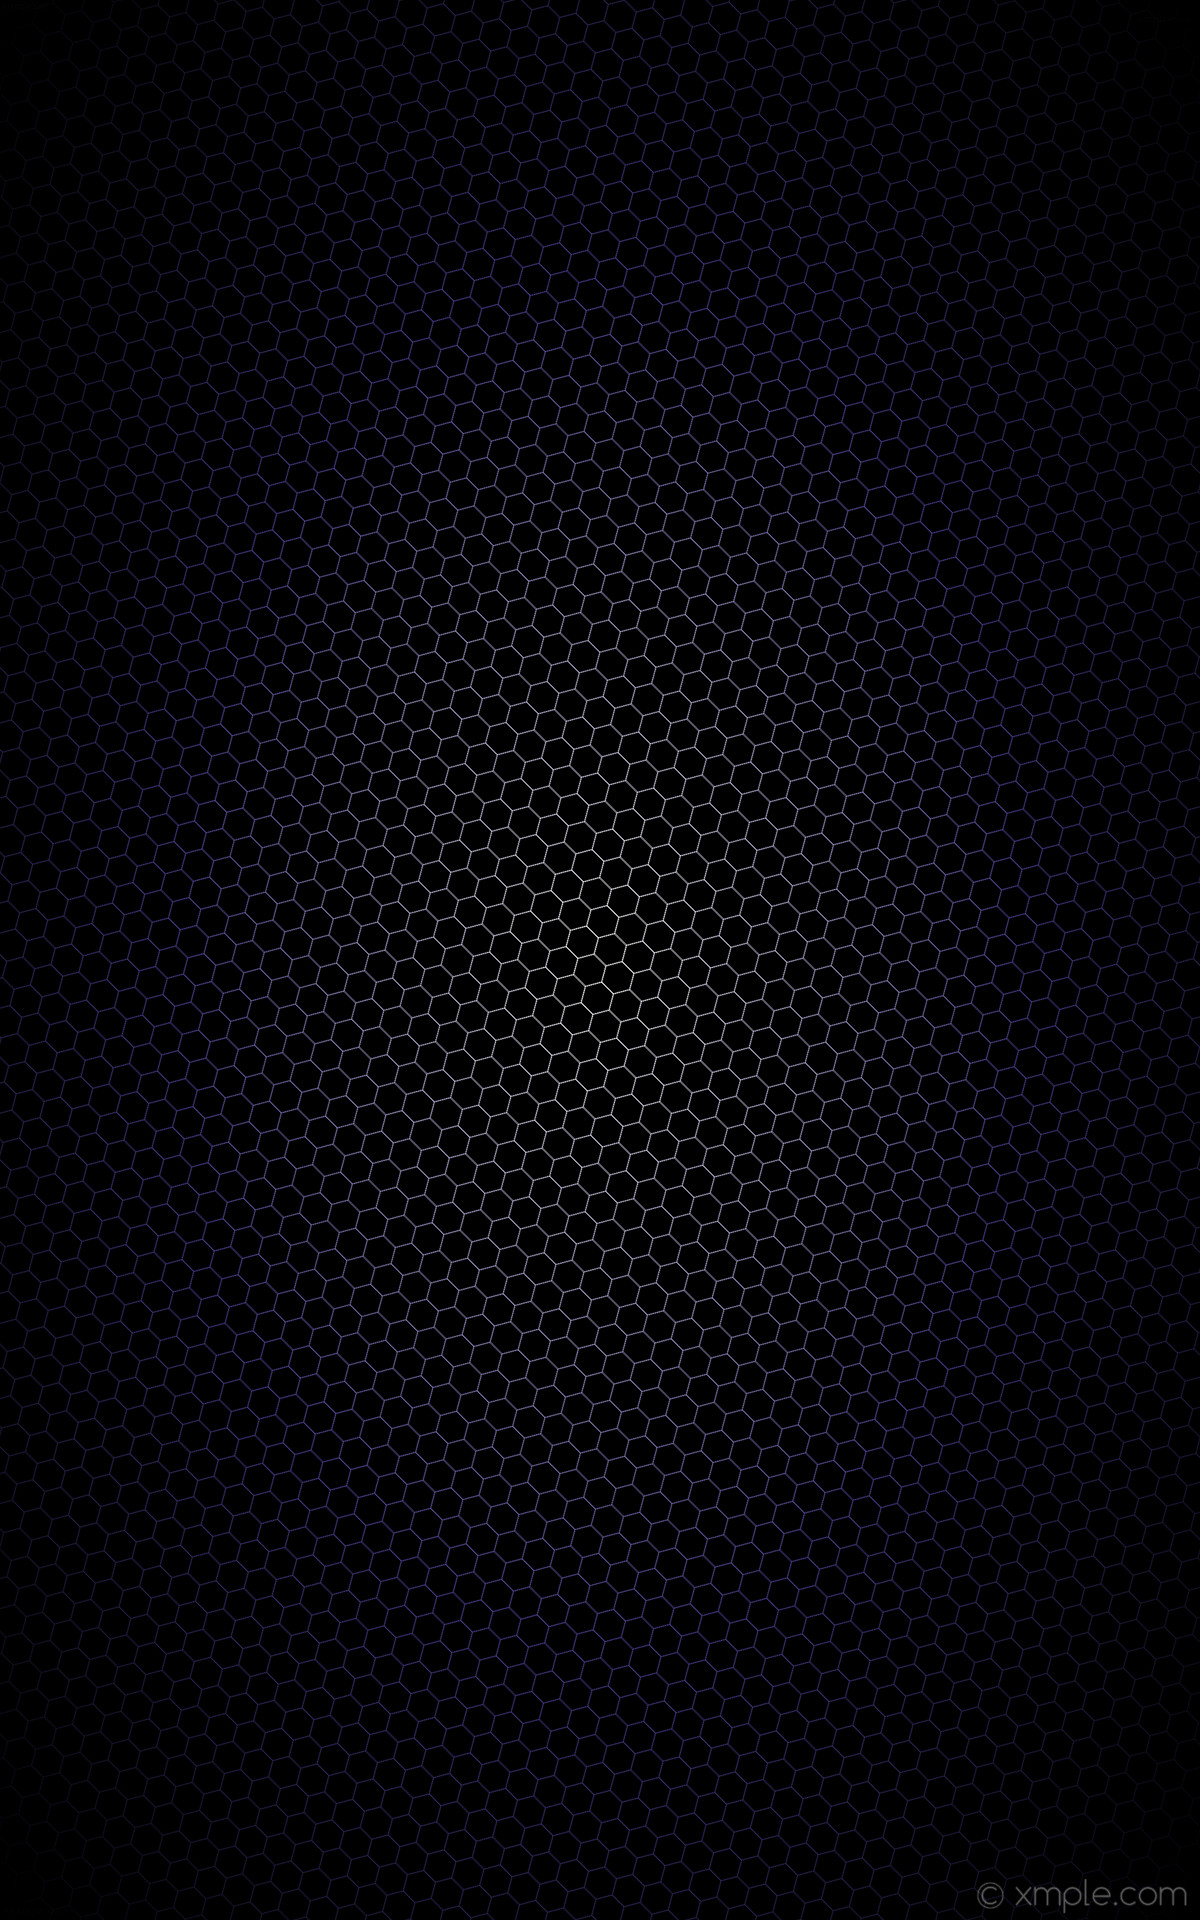 wallpaper black white hexagon purple glow gradient dark slate blue #000000  #ffffff #483d8b